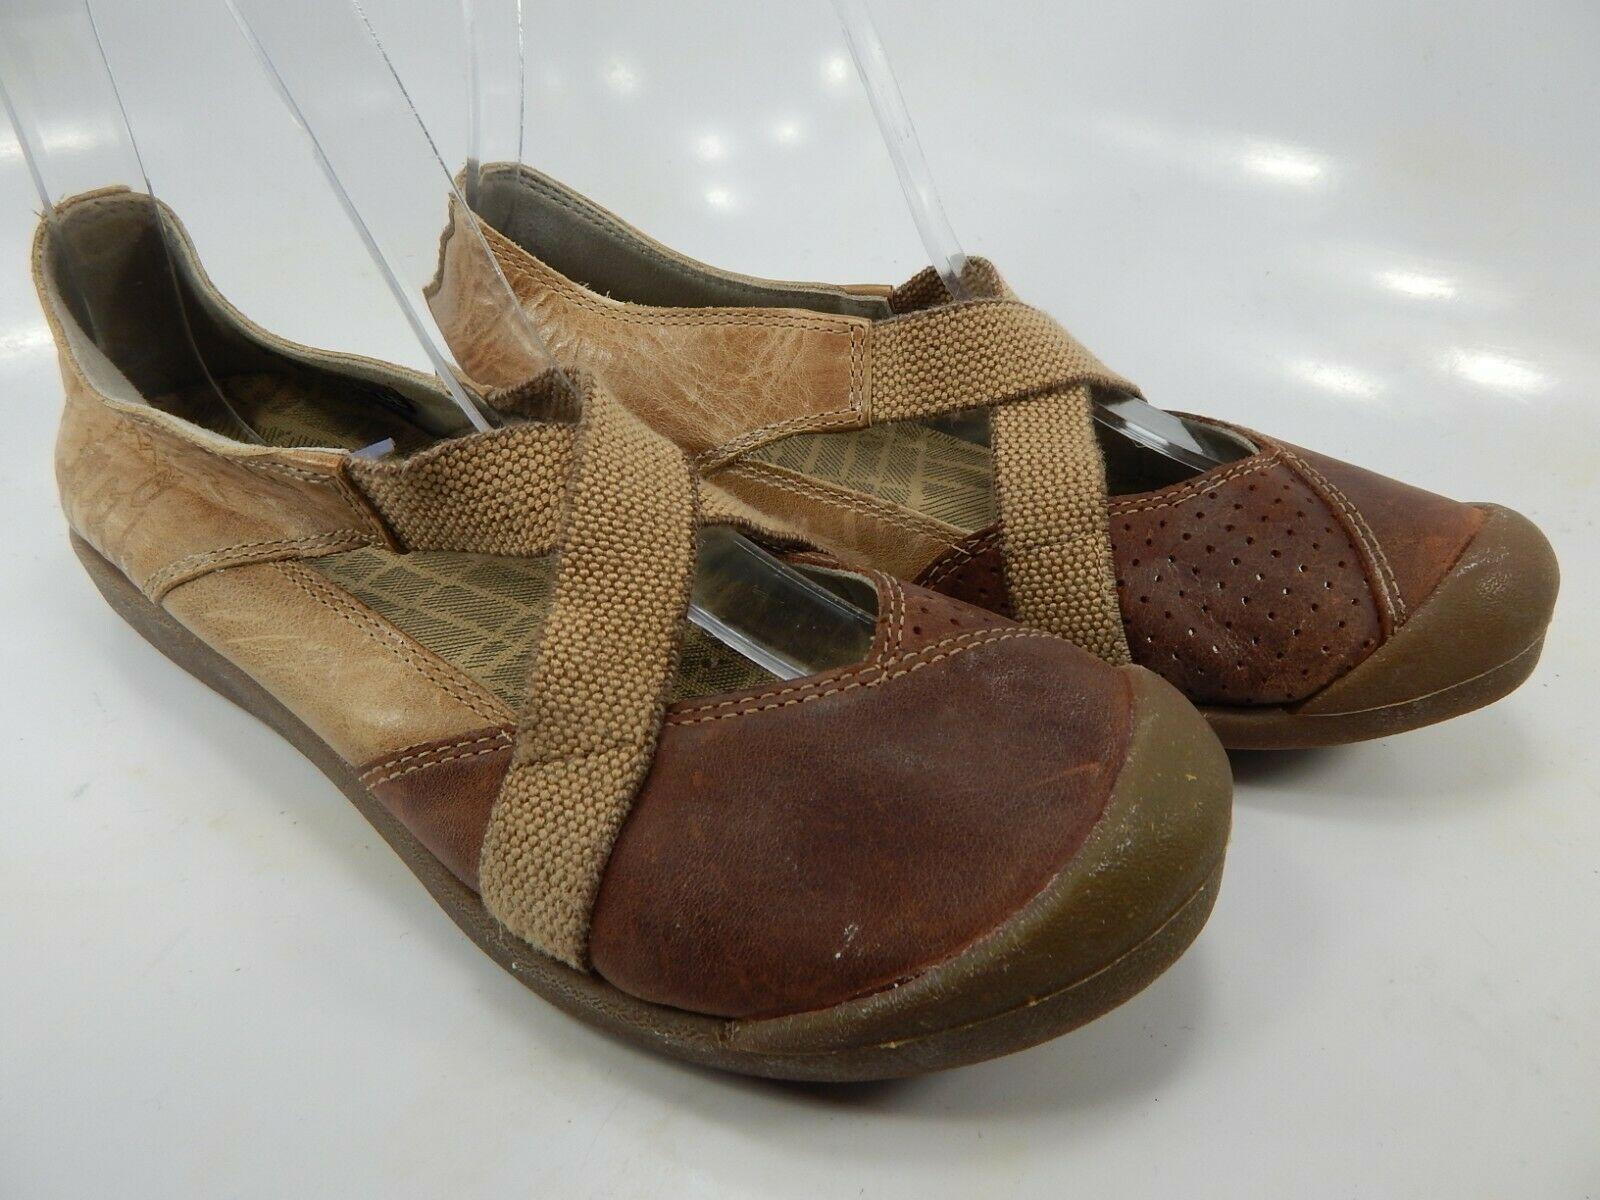 Keen Lower East Side Mary Jane Size 7 M (B) EU 37.5 Women's Ballet Flats Shoes - $61.95